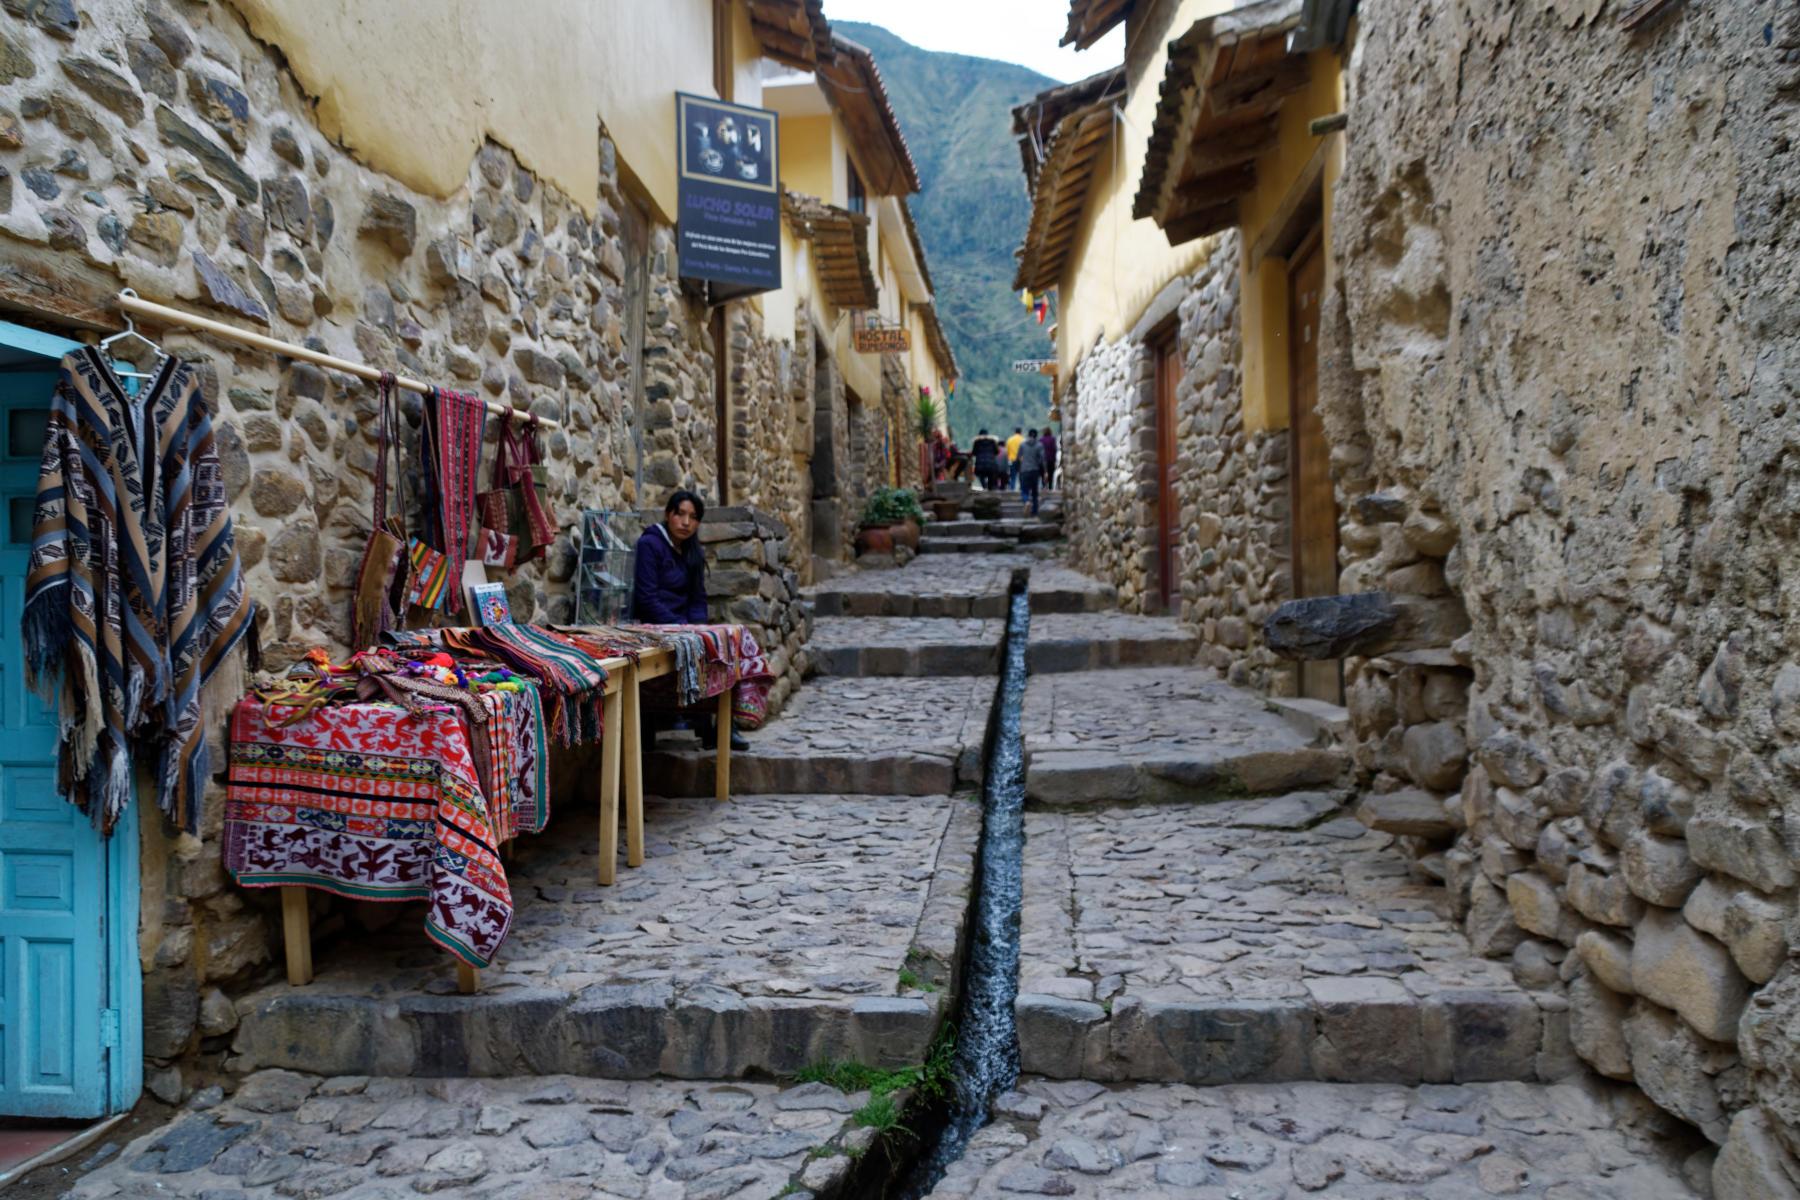 Ollantaytambo - street with aqueduct